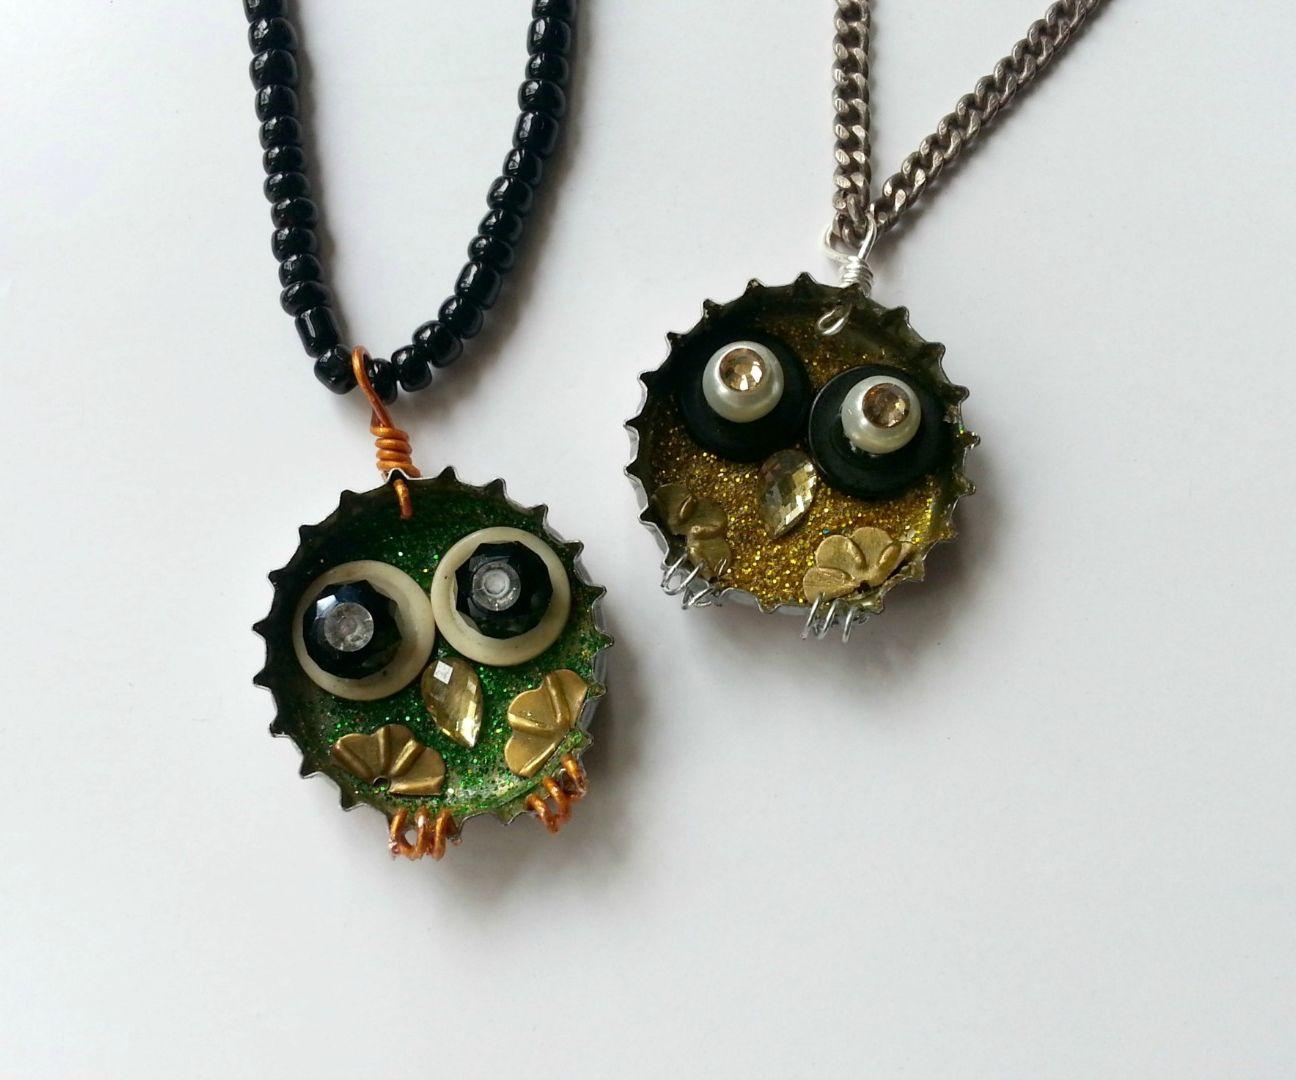 DIY Owl Pendant from Junk